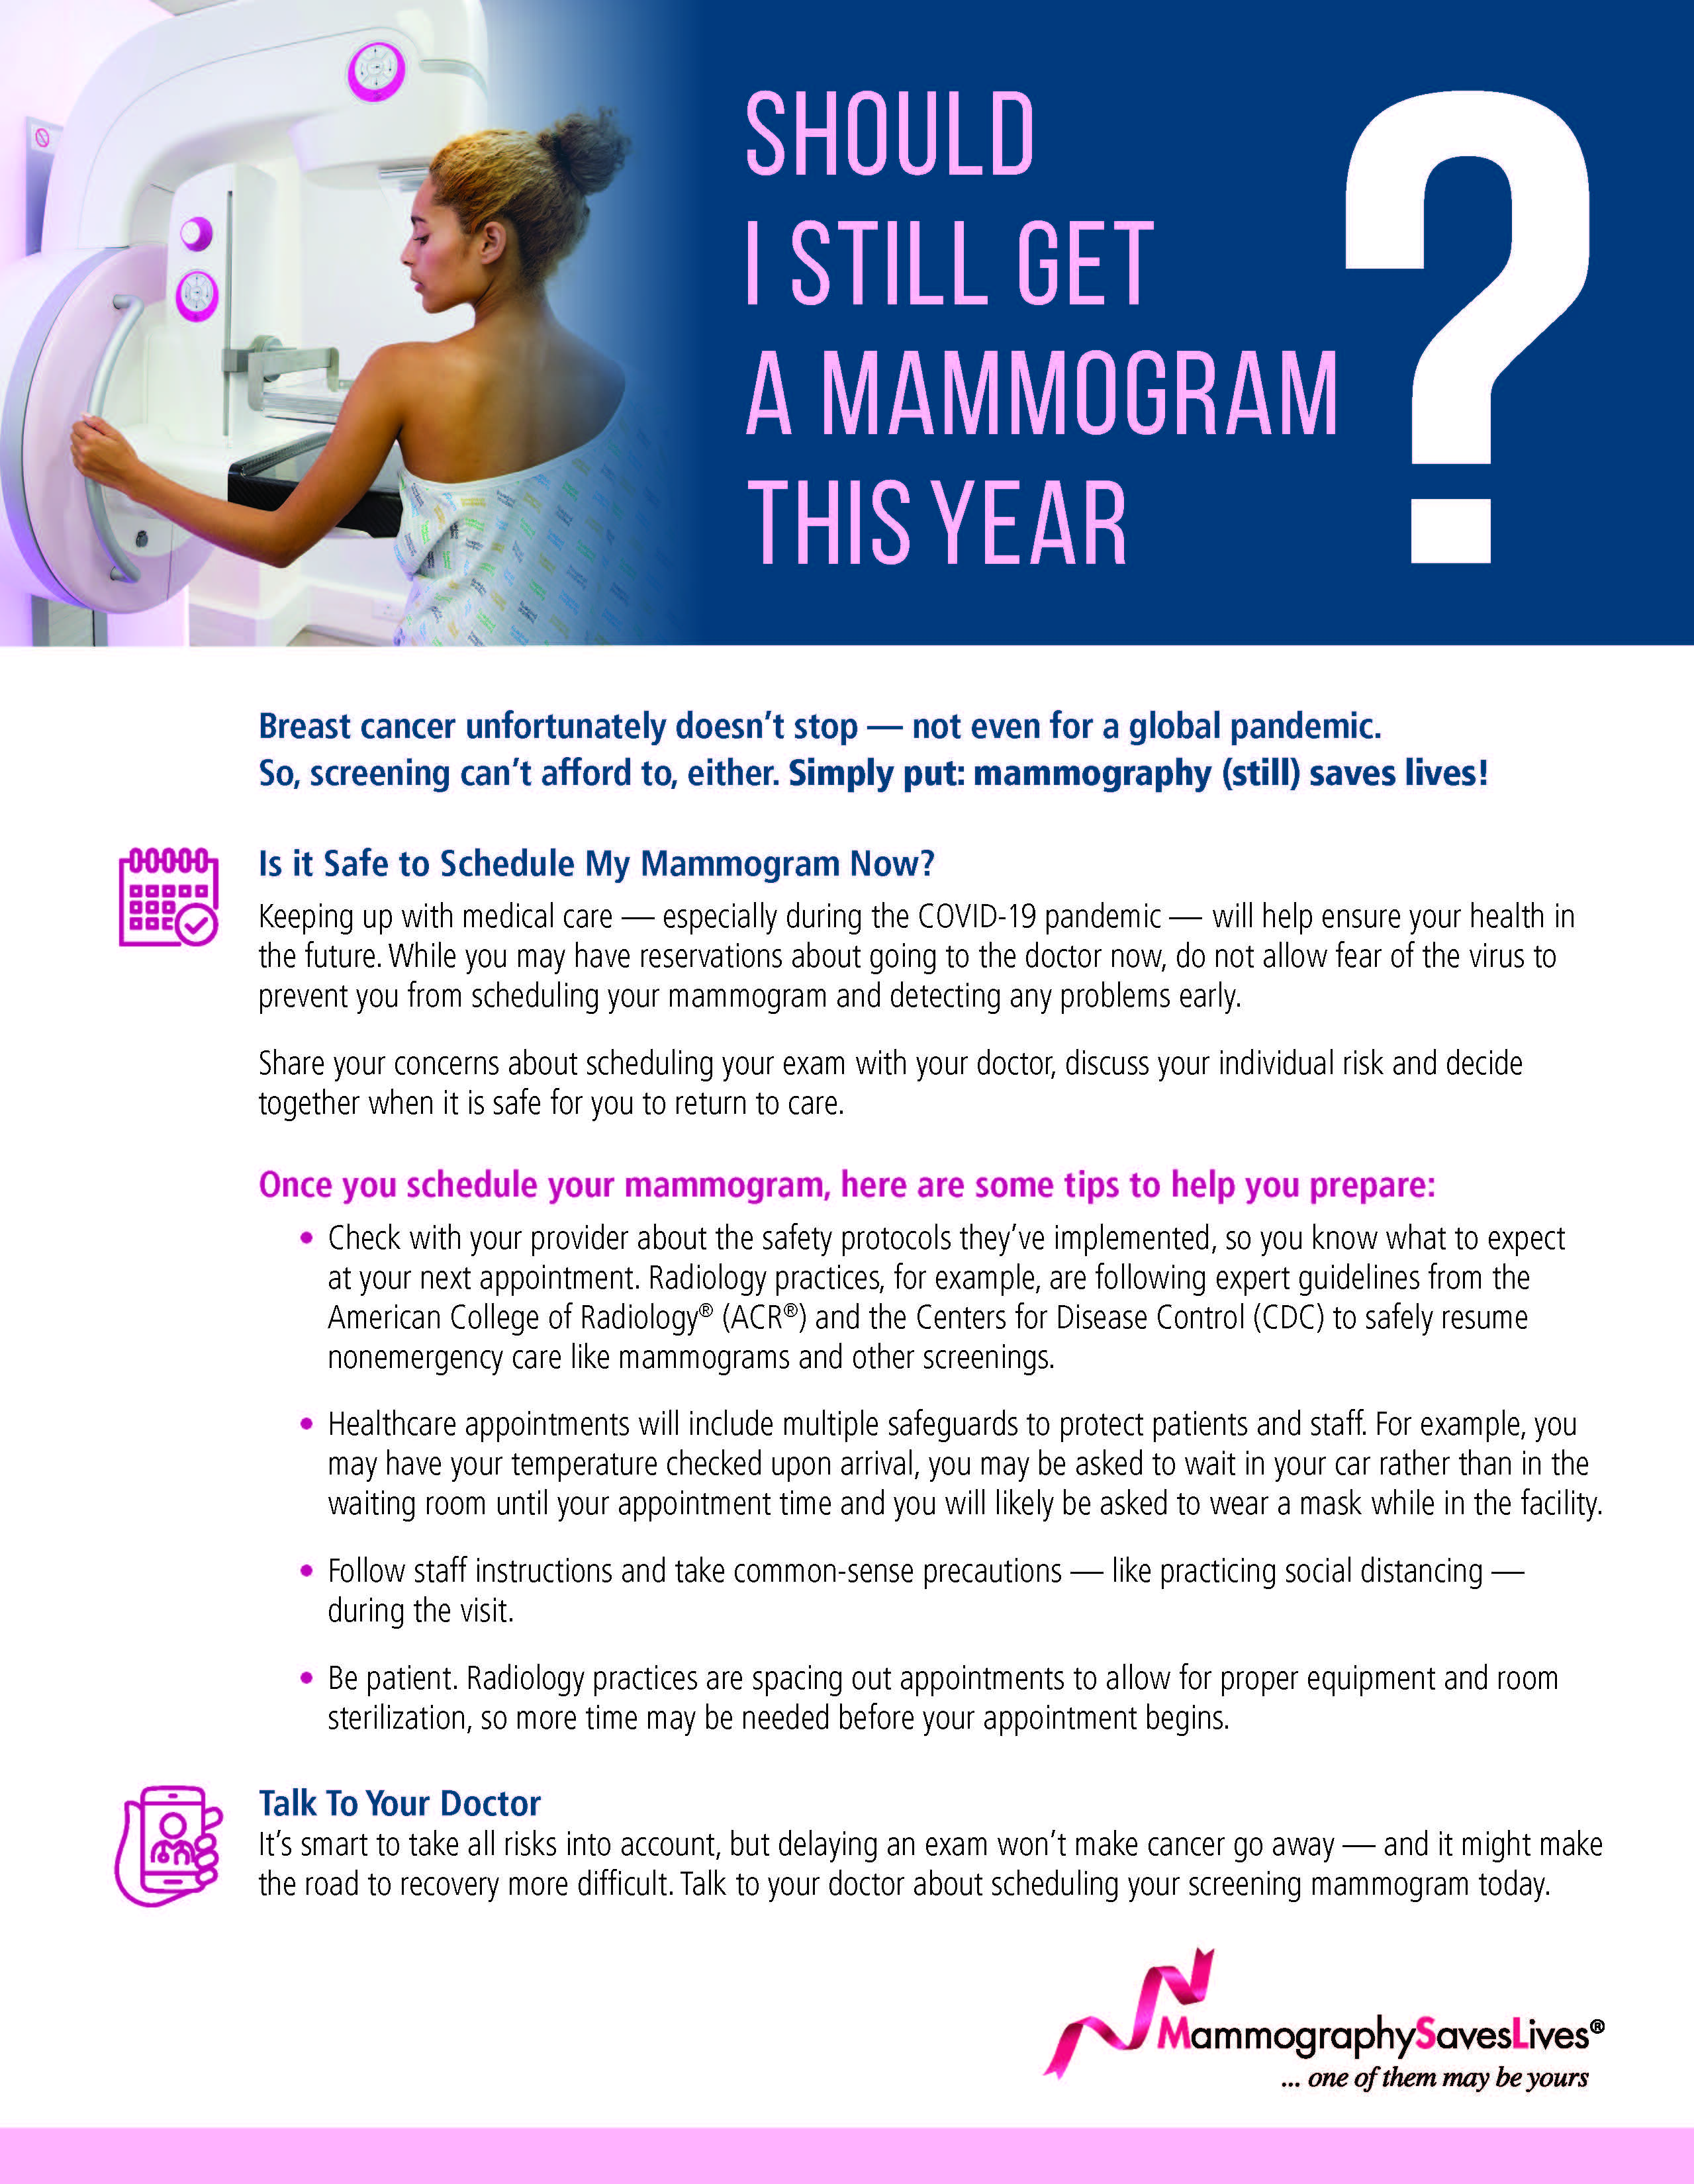 Should I still get a Mammogram this year?